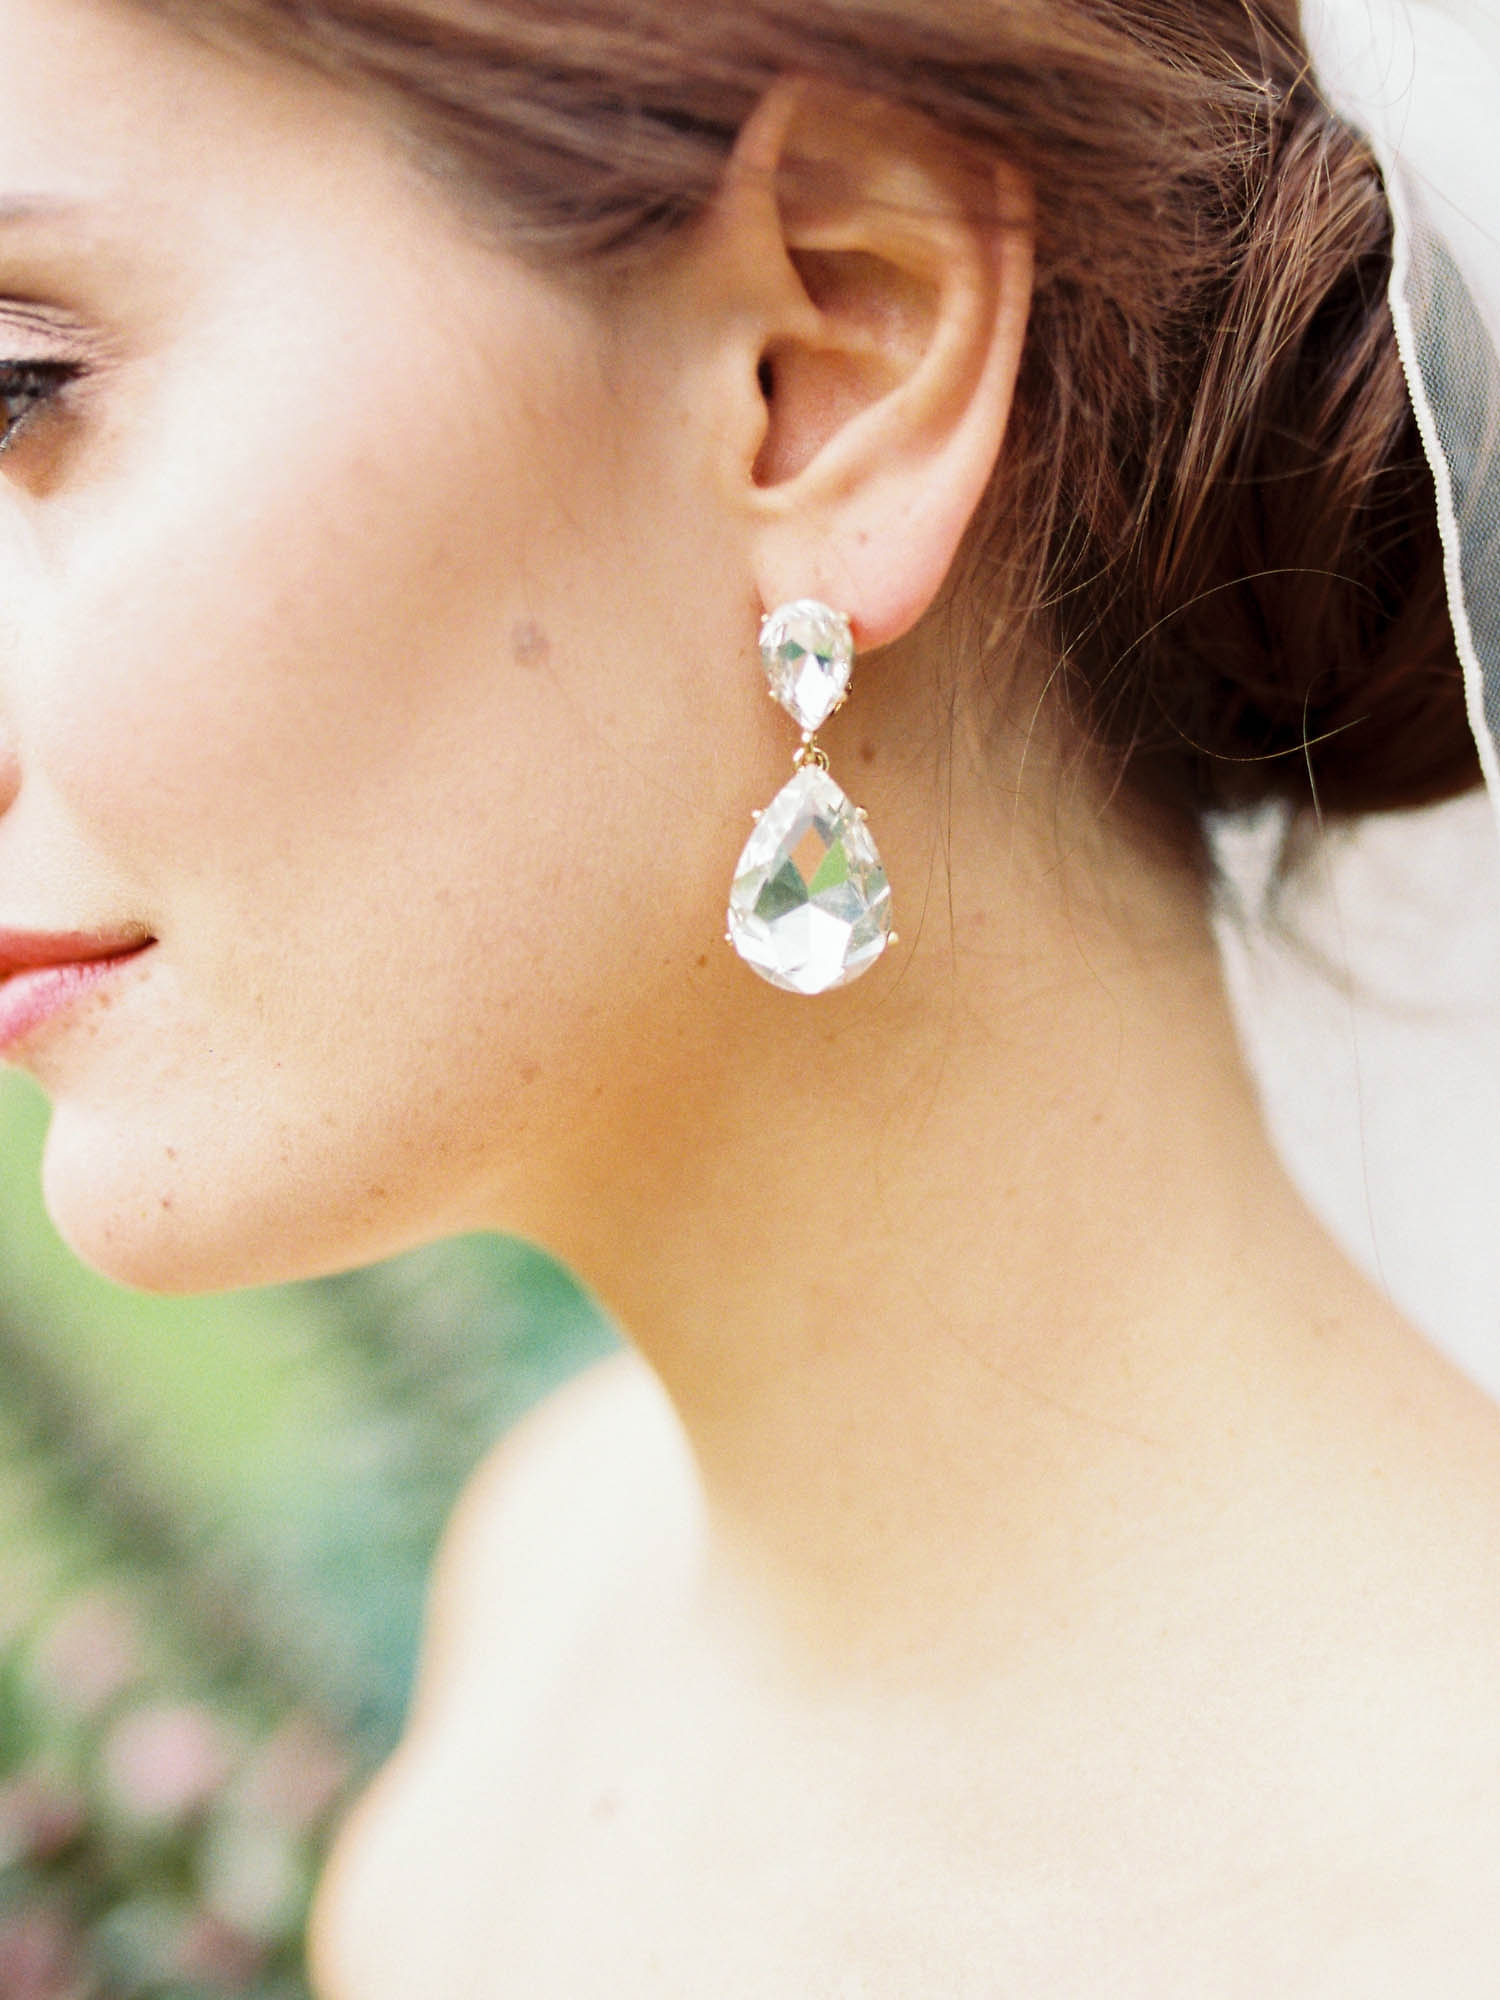 timeless-glamour-wedding-inspiration-aleeka-events-wedding-event-planner-stylist-uk-london-amy-o-boyle-photography